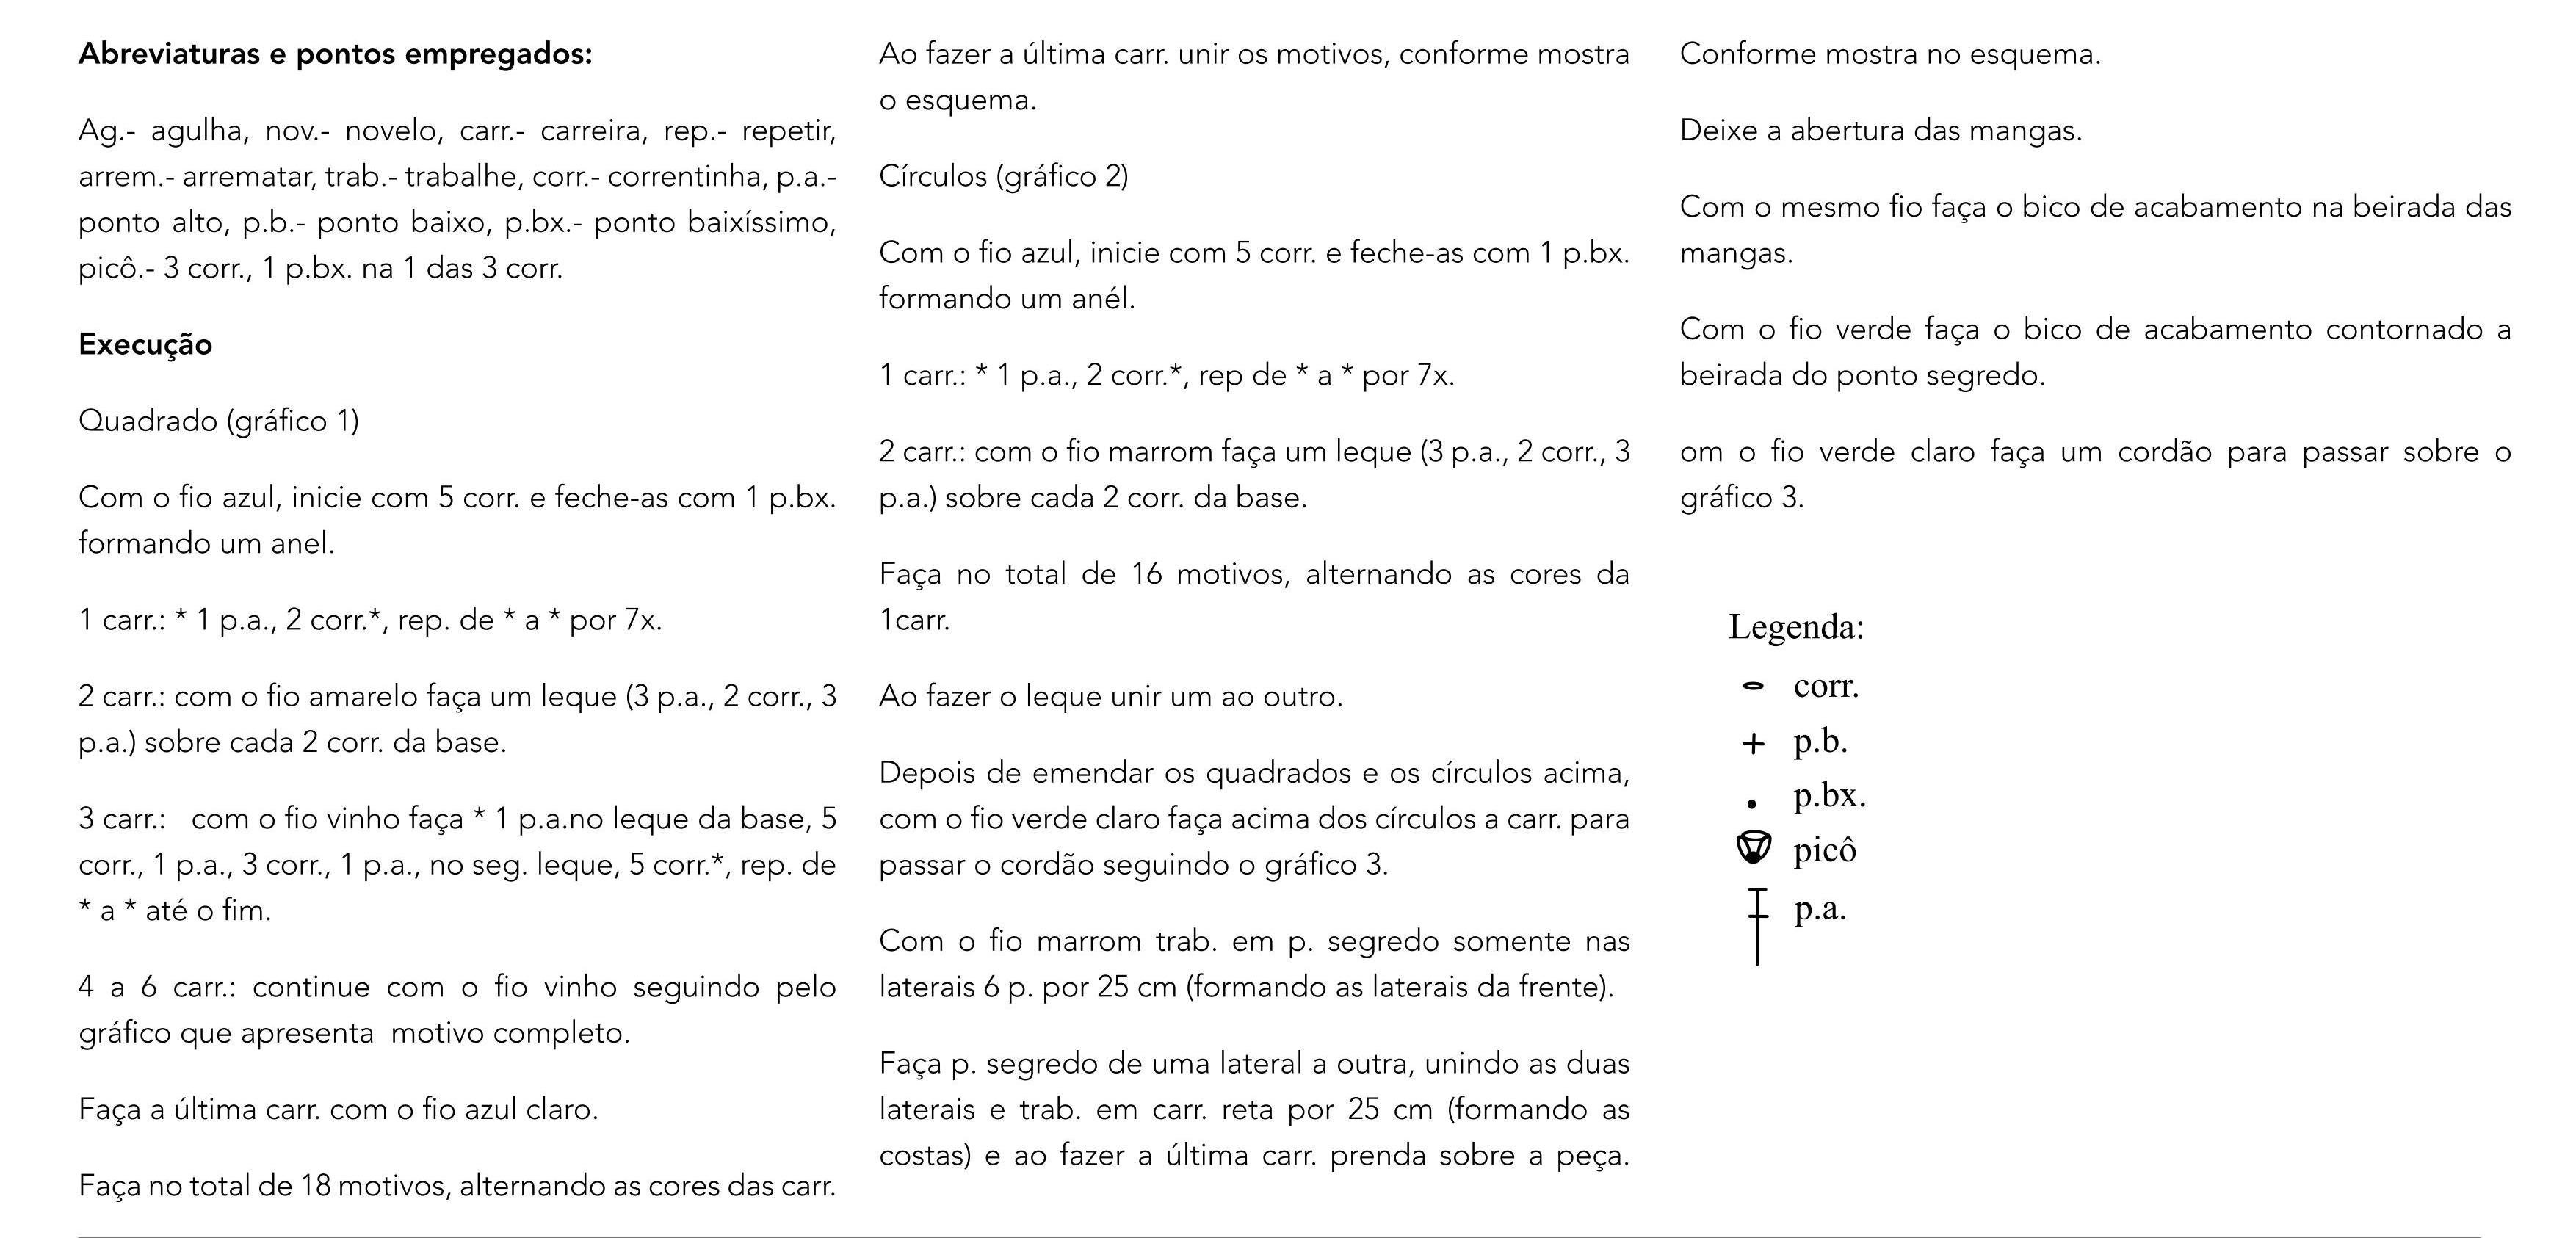 0263_SadadePraiacoloridoCamilaFashion1 (3)